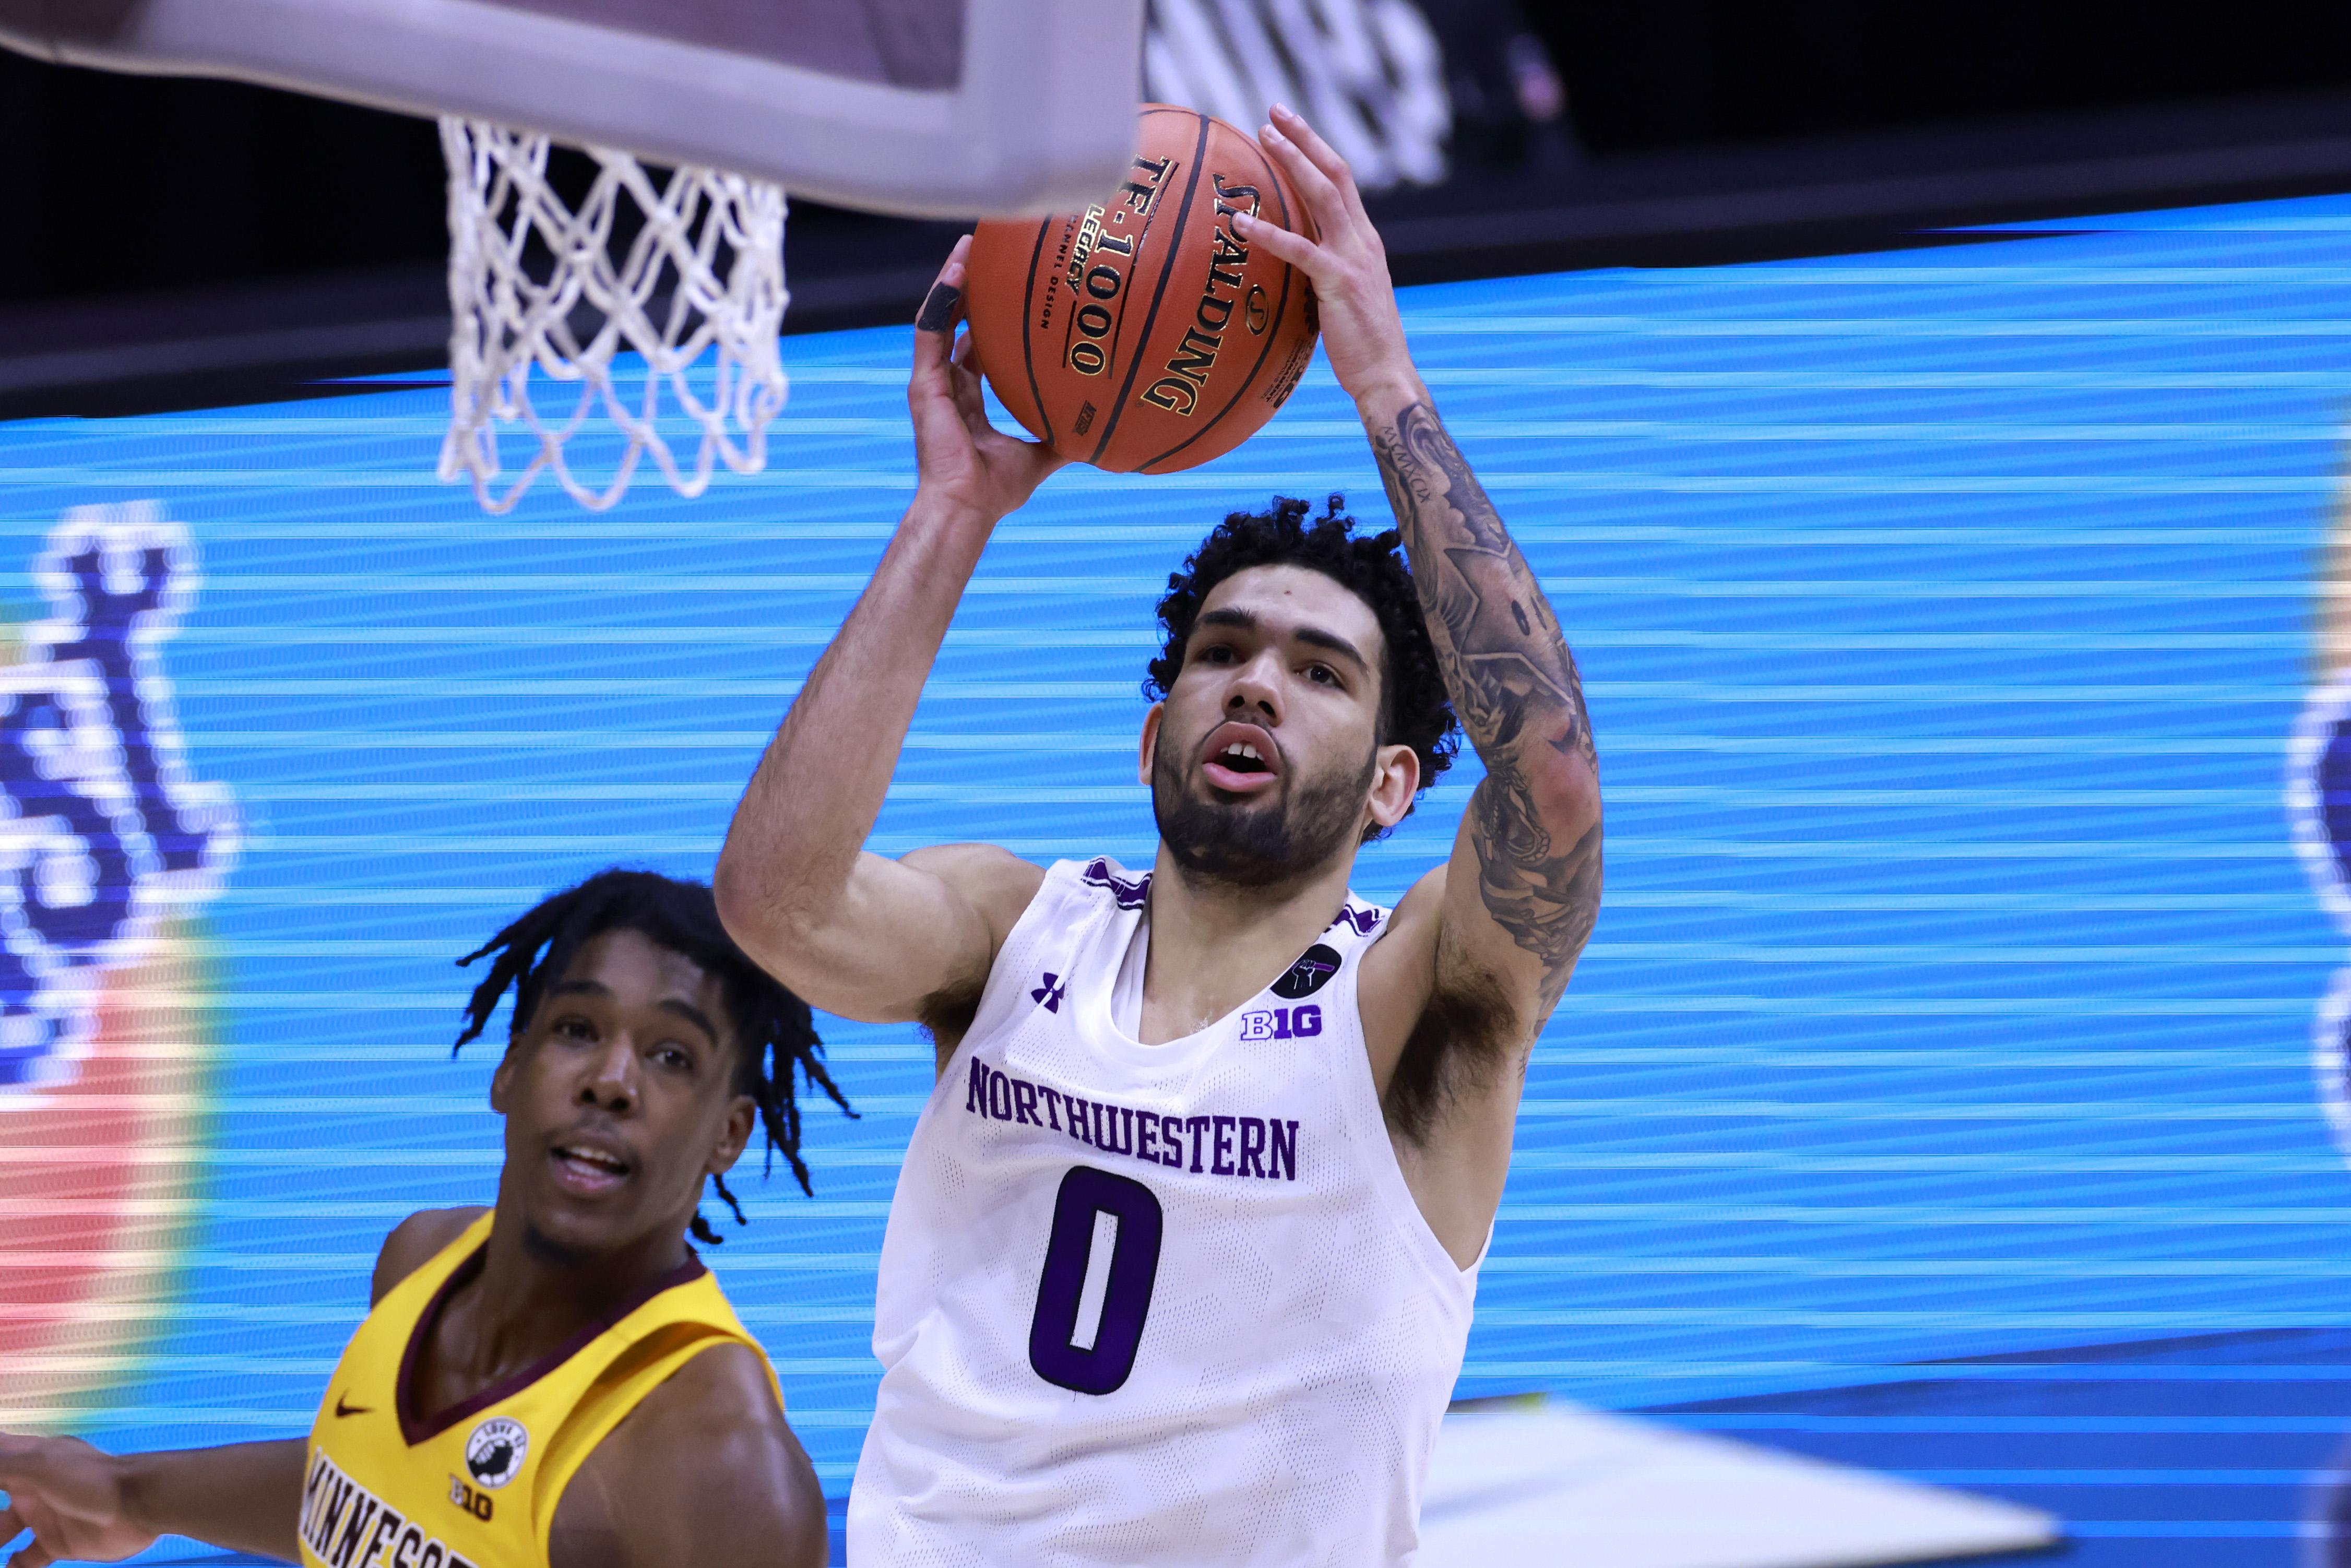 Big Ten Men's Basketball Tournament - Minnesota v Northwestern